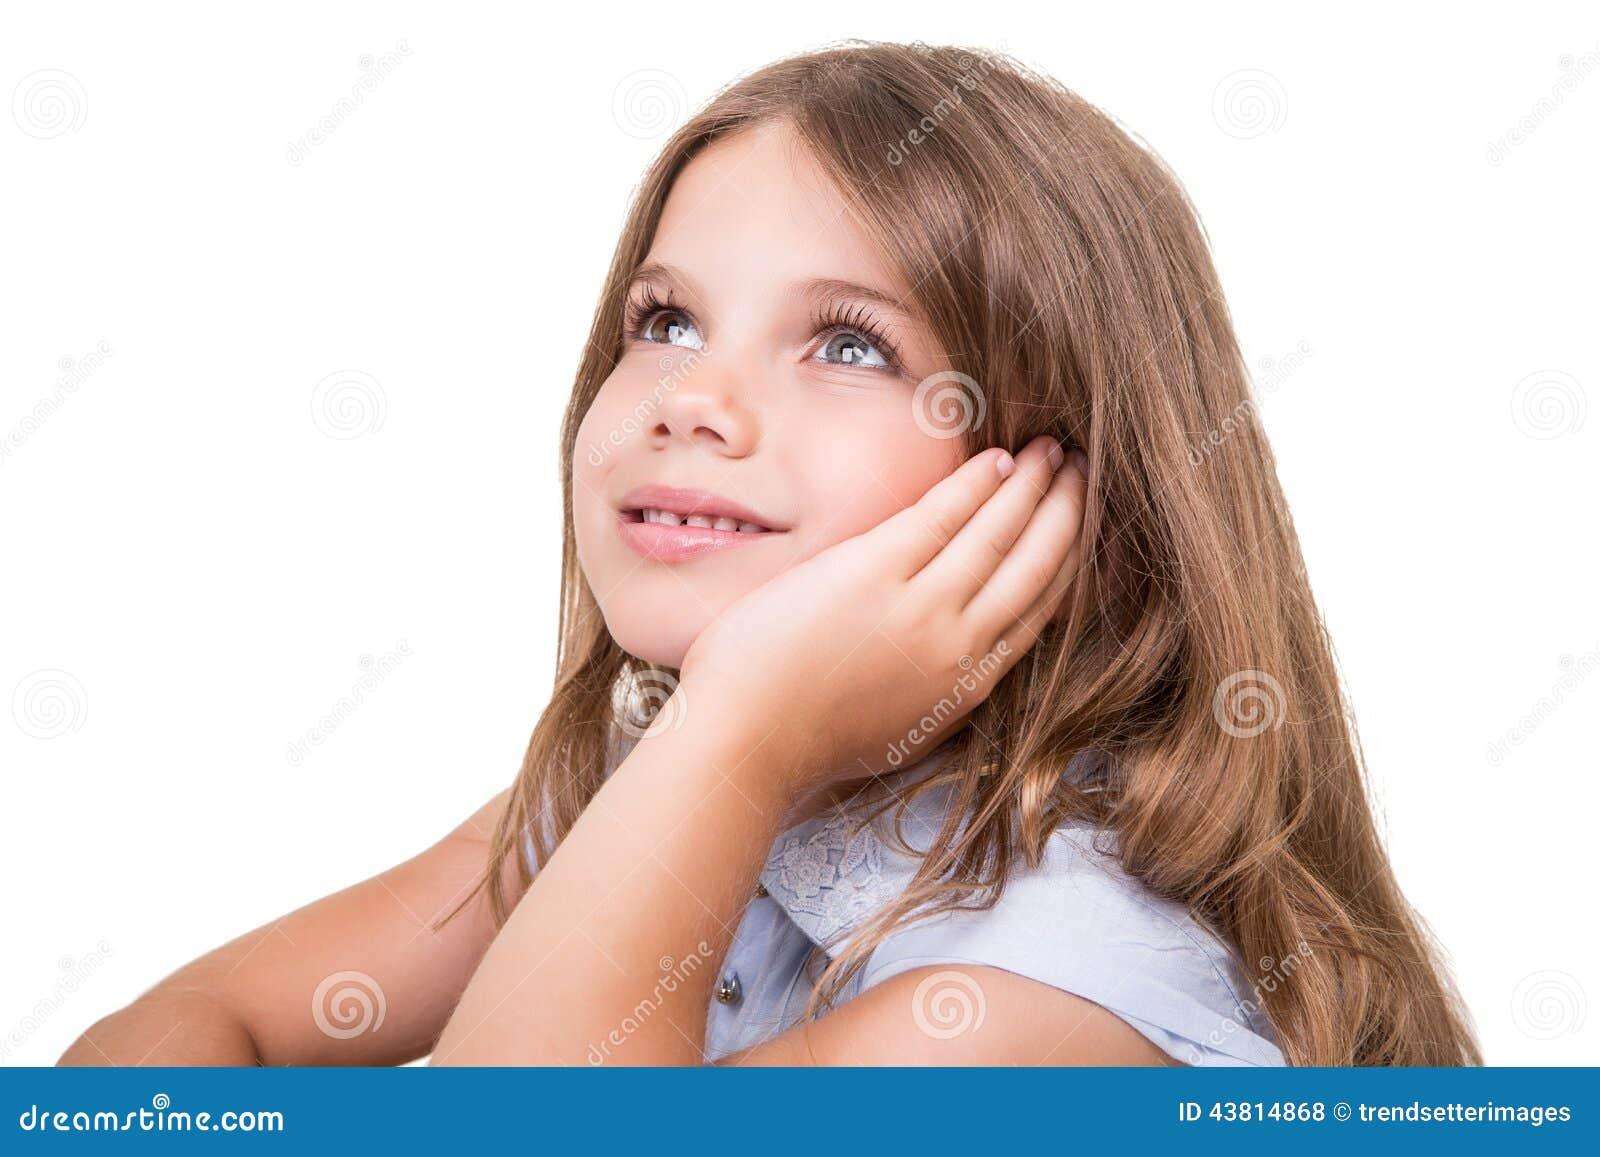 Piercing Girl Looking The